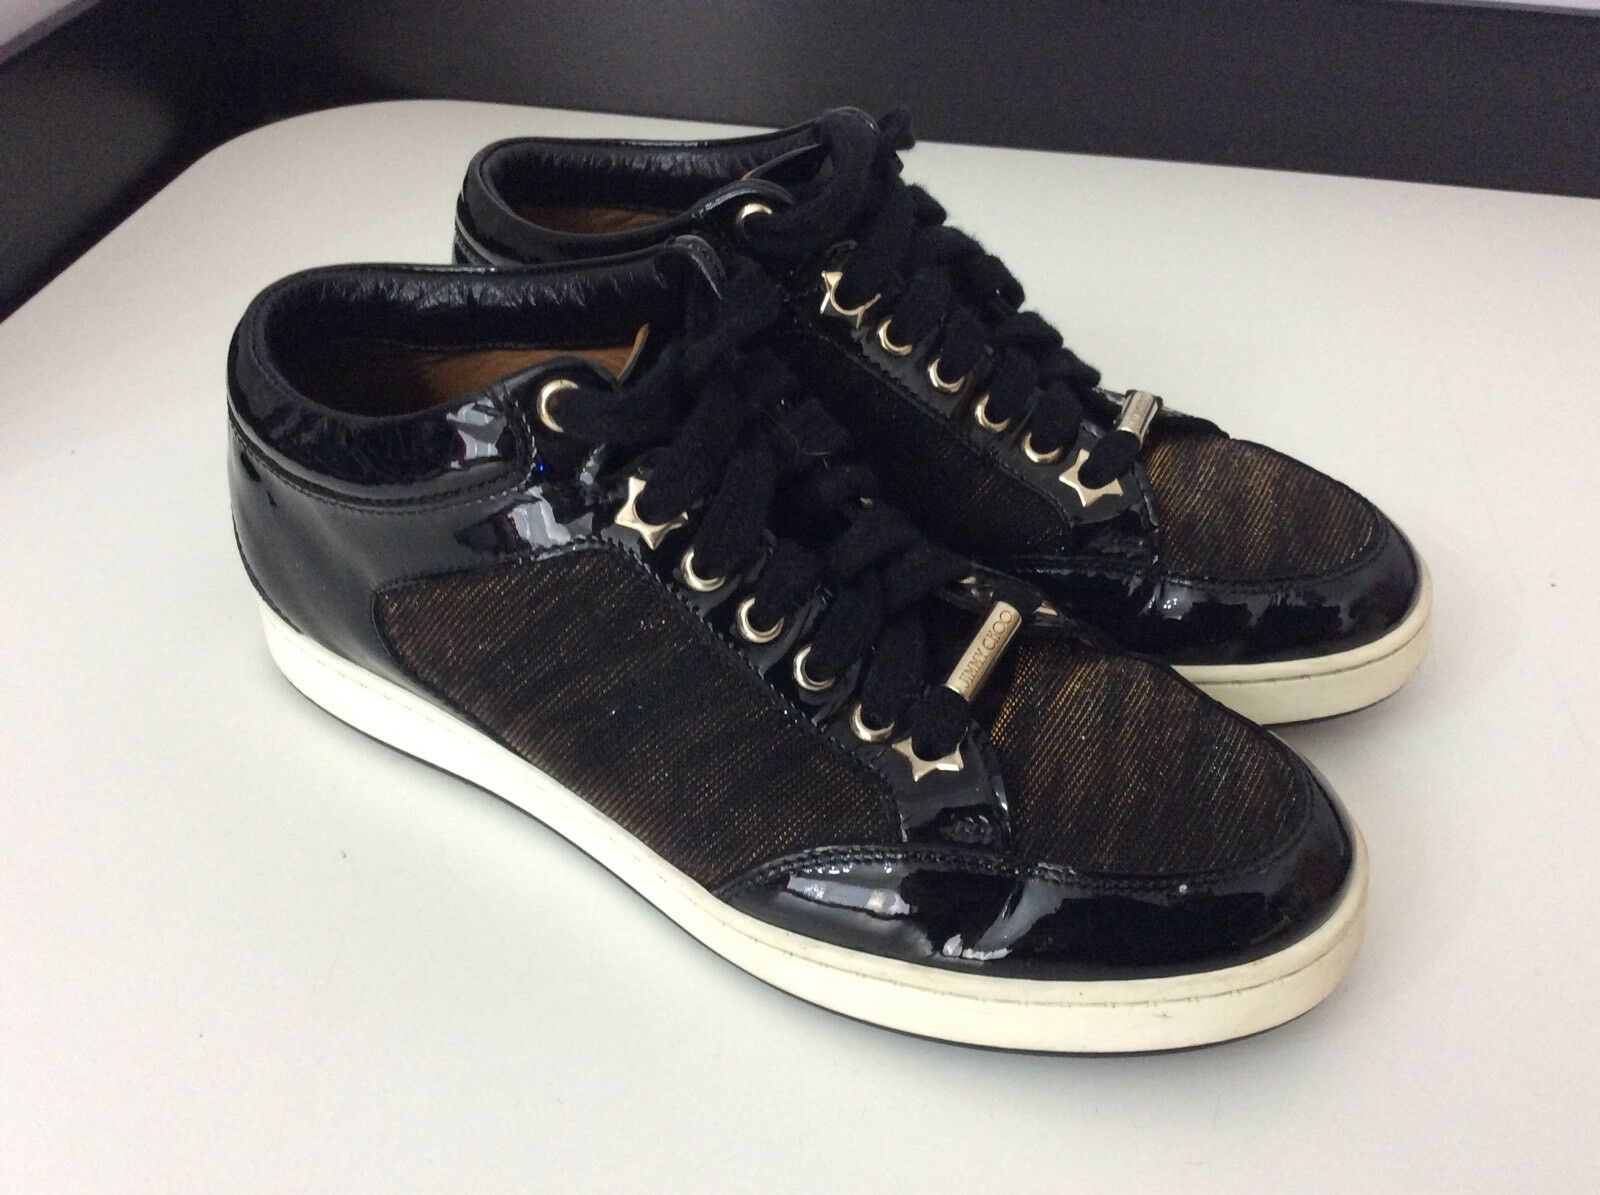 Jimmy CHOO scarpe da ginnastica top basse in pelle in vernice nera misura 35 Regno Unito 2